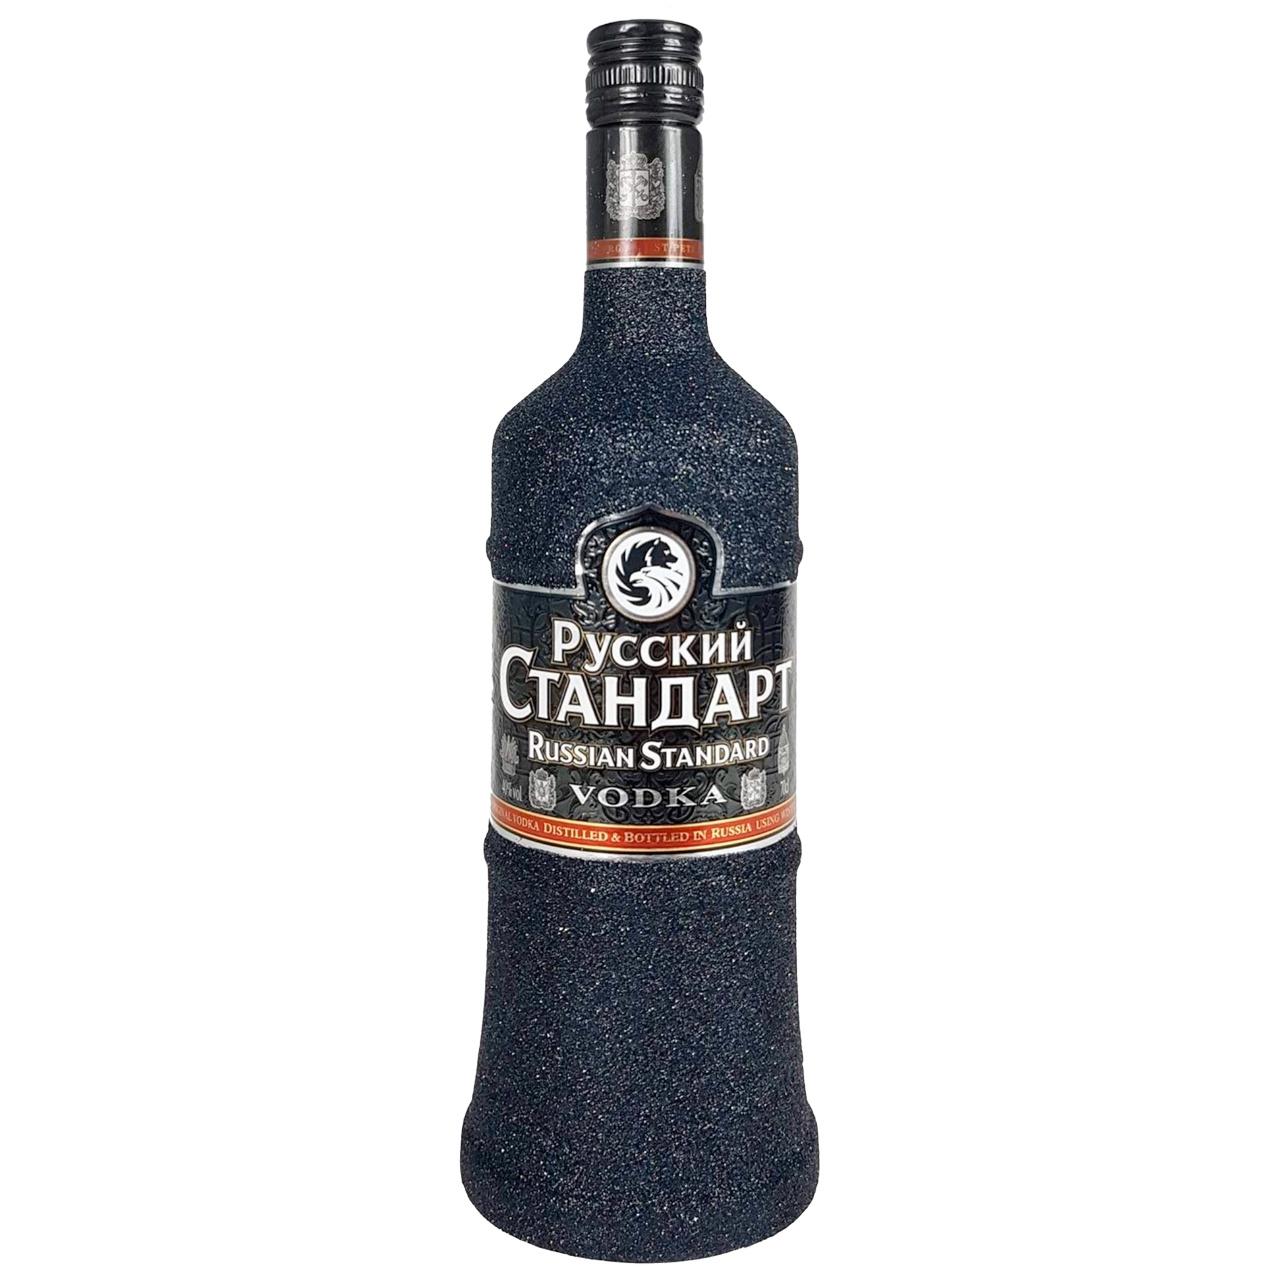 Vodka Glitzer Russian Standard Original Vodka (0,7L)